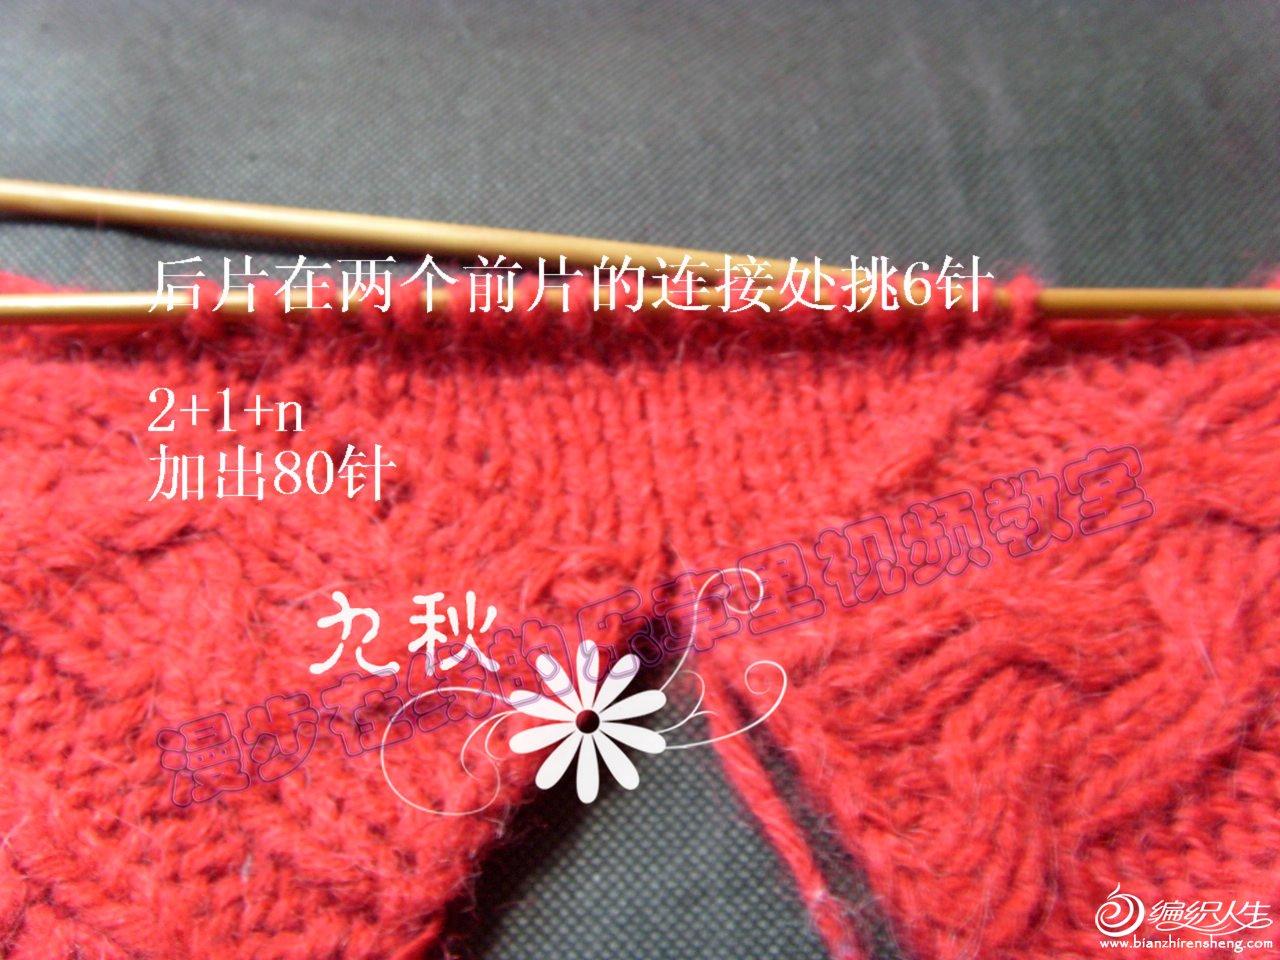 S73R5054.jpg